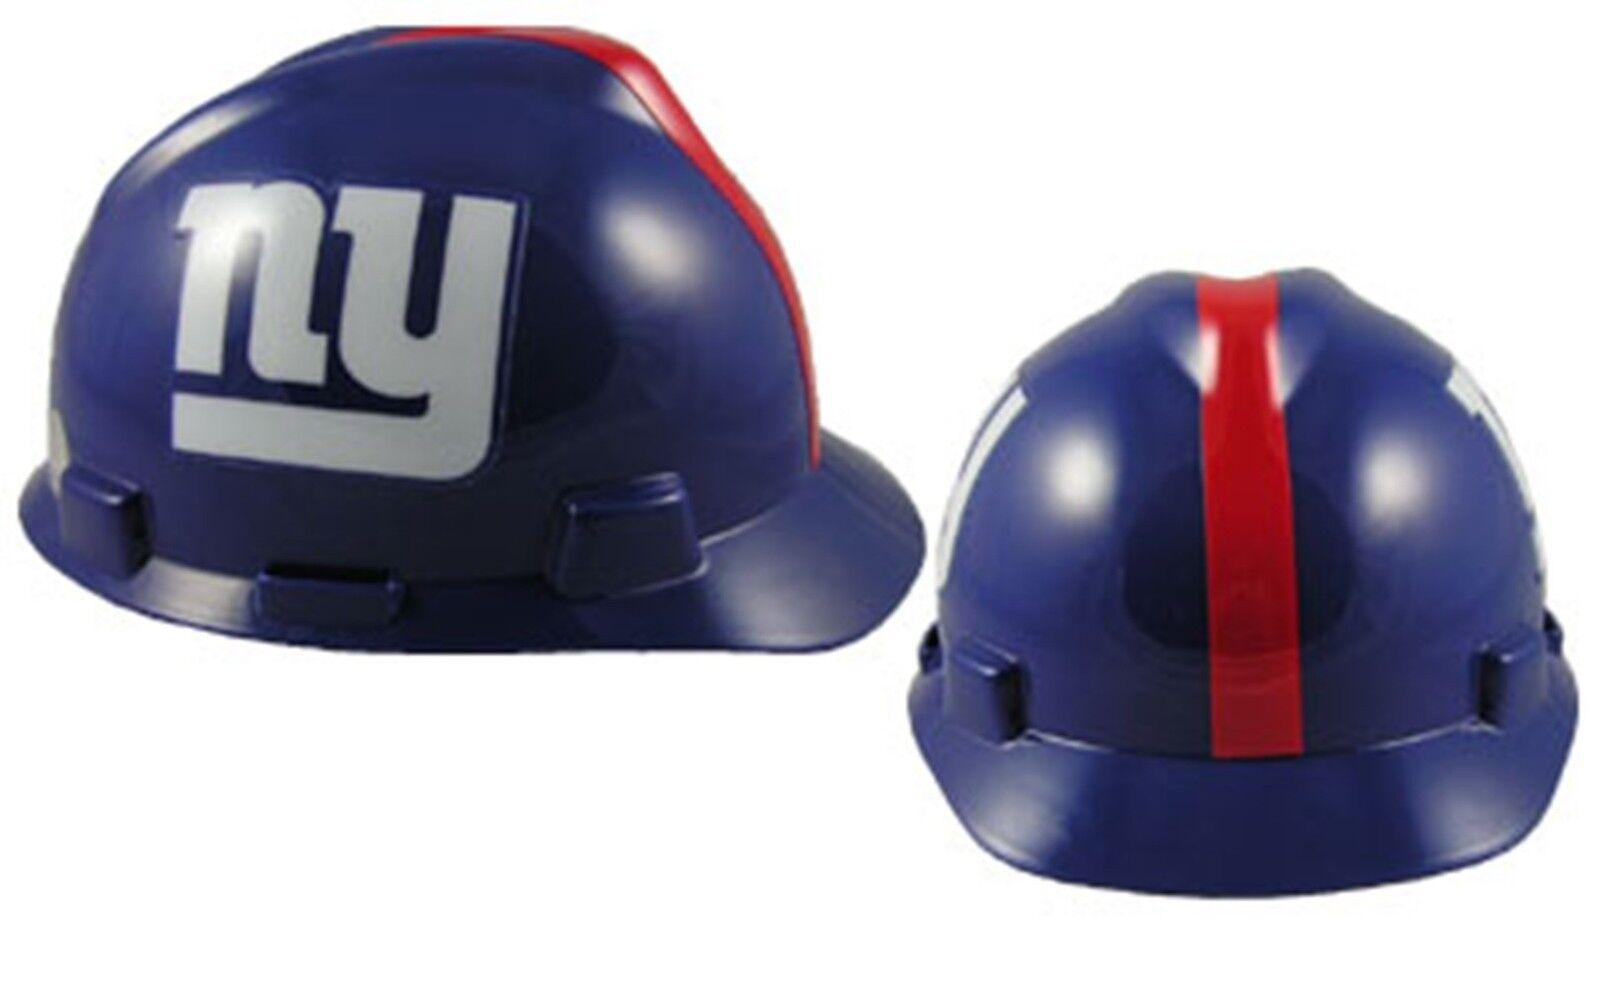 MSA V-Gard Cap Type New York Giants NFL Hard Hat Pin Type Suspension ... 36331b86324